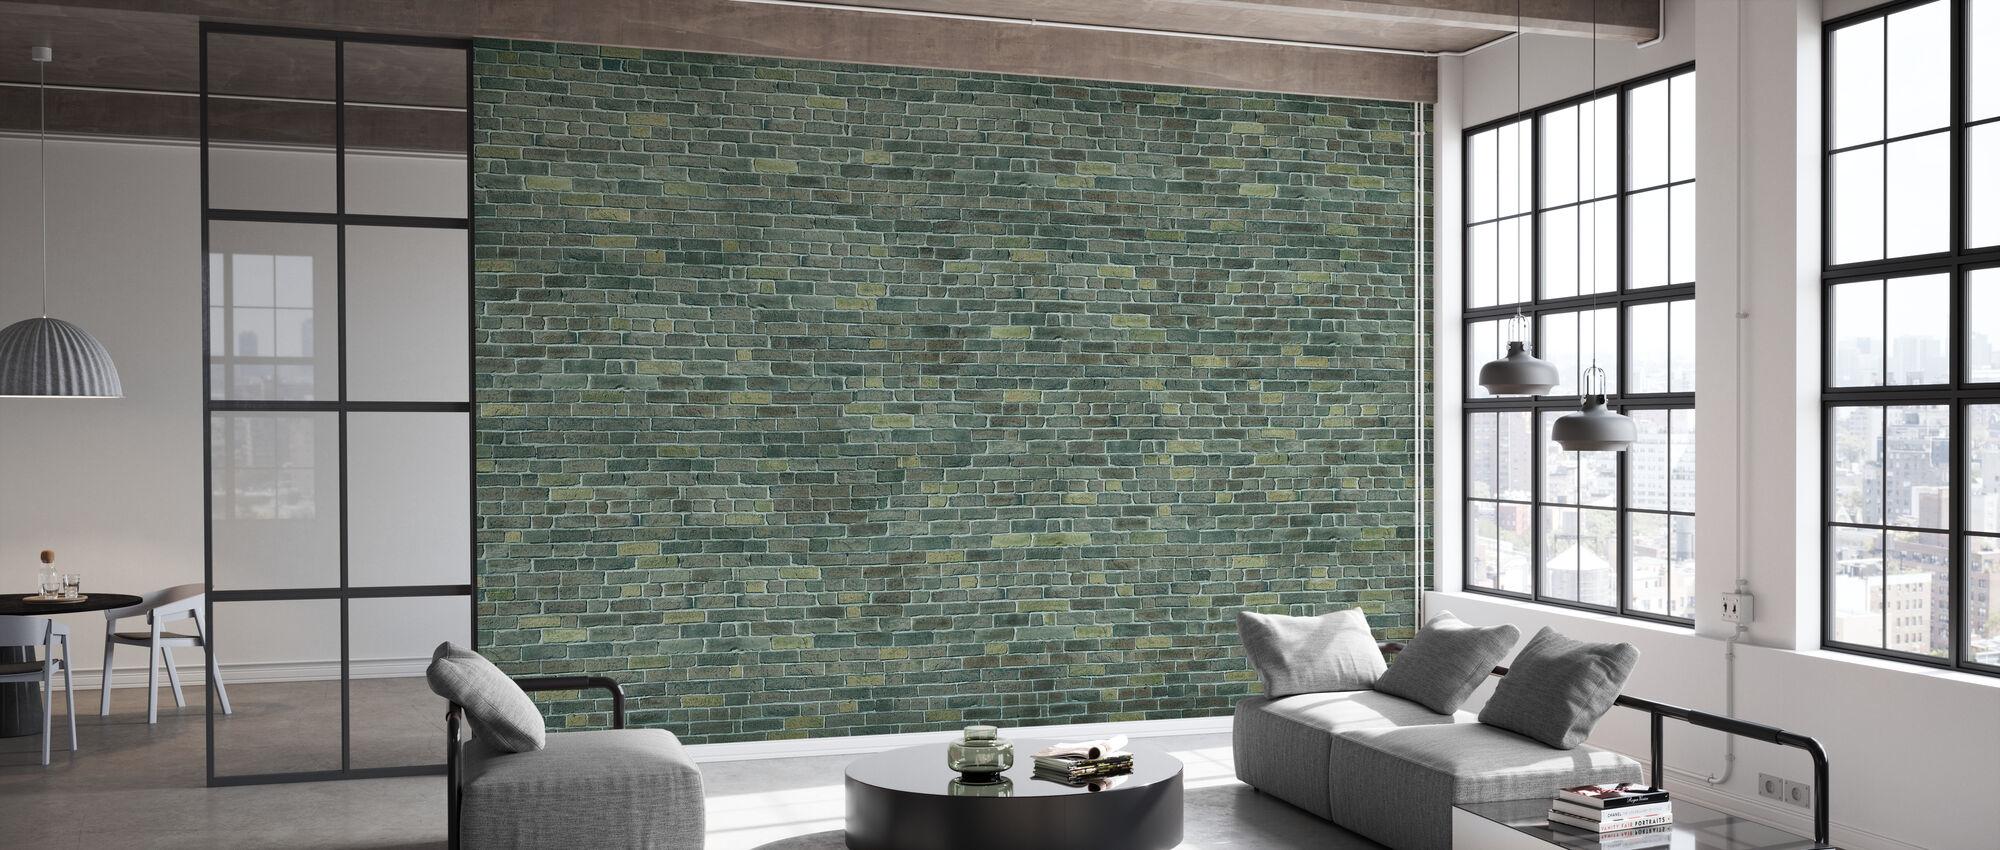 Green Brick Wall - Wallpaper - Office